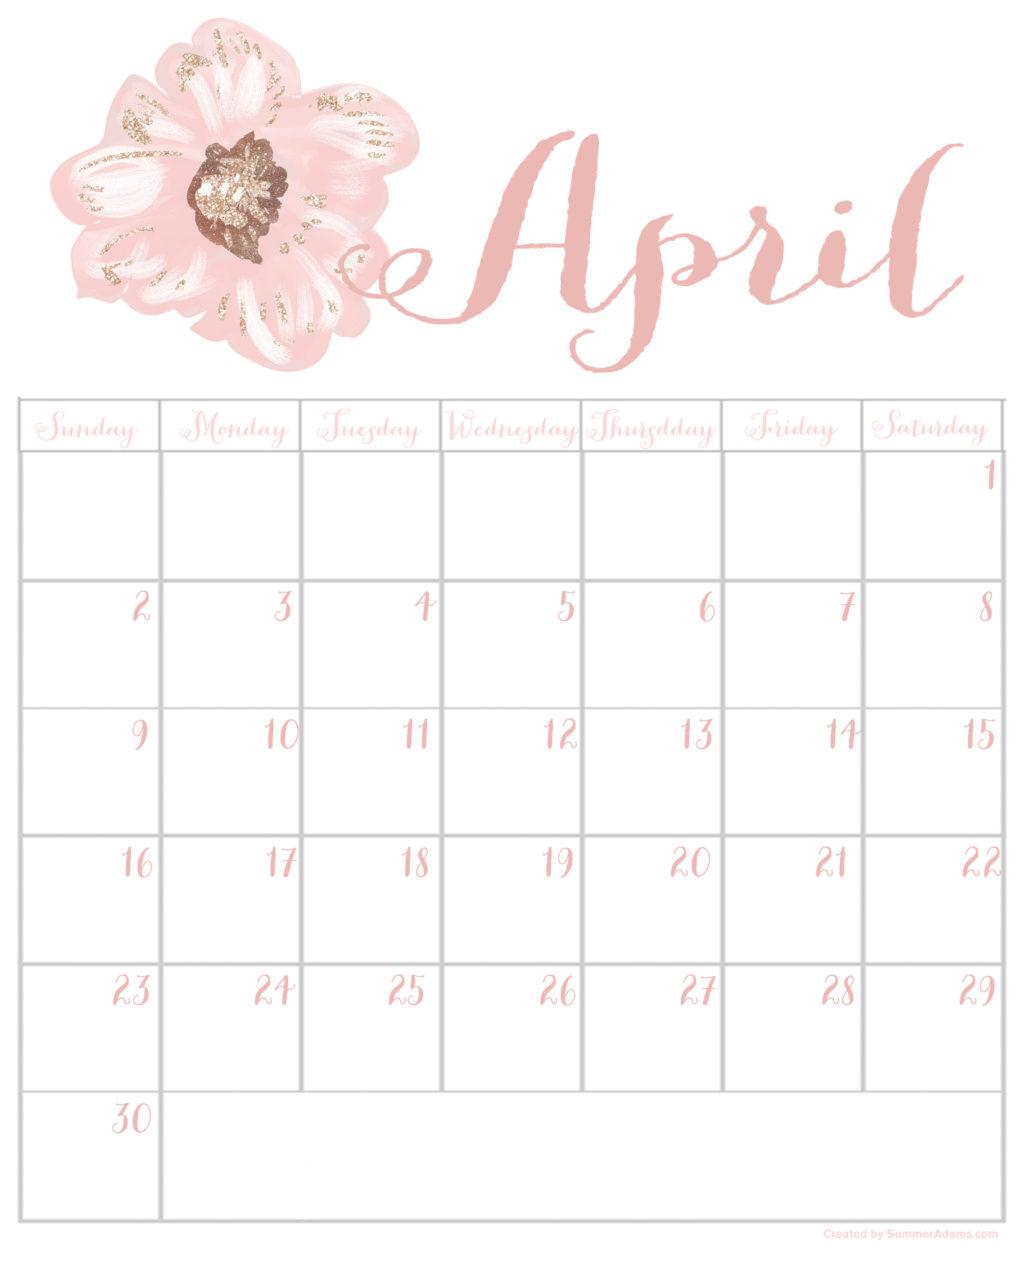 Printable Calendar April 2017 free april 2017 printable calendar - summer adams